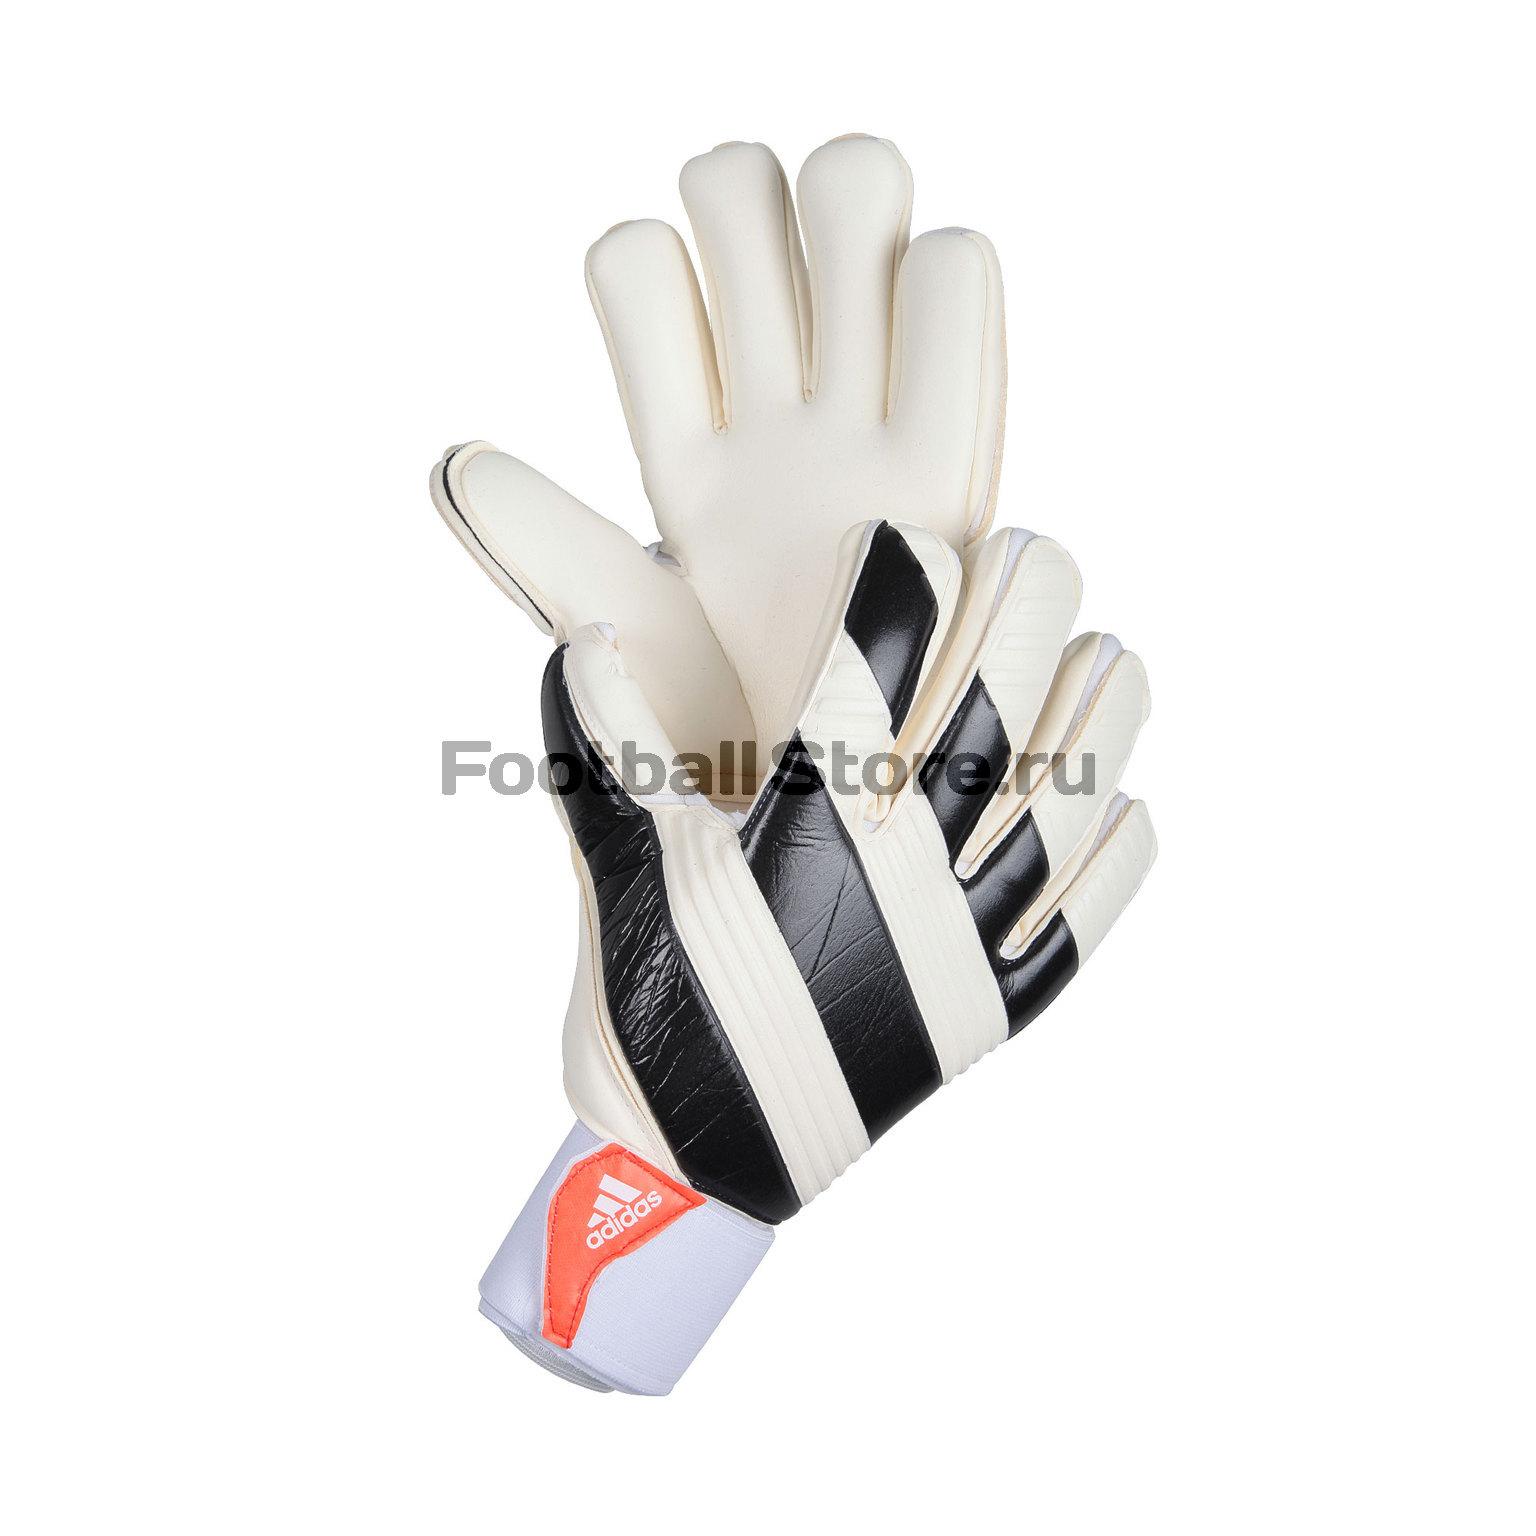 Перчатки вратарские Adidas Classic Pro AP7009 перчатки вратарские adidas ace half neg az3688